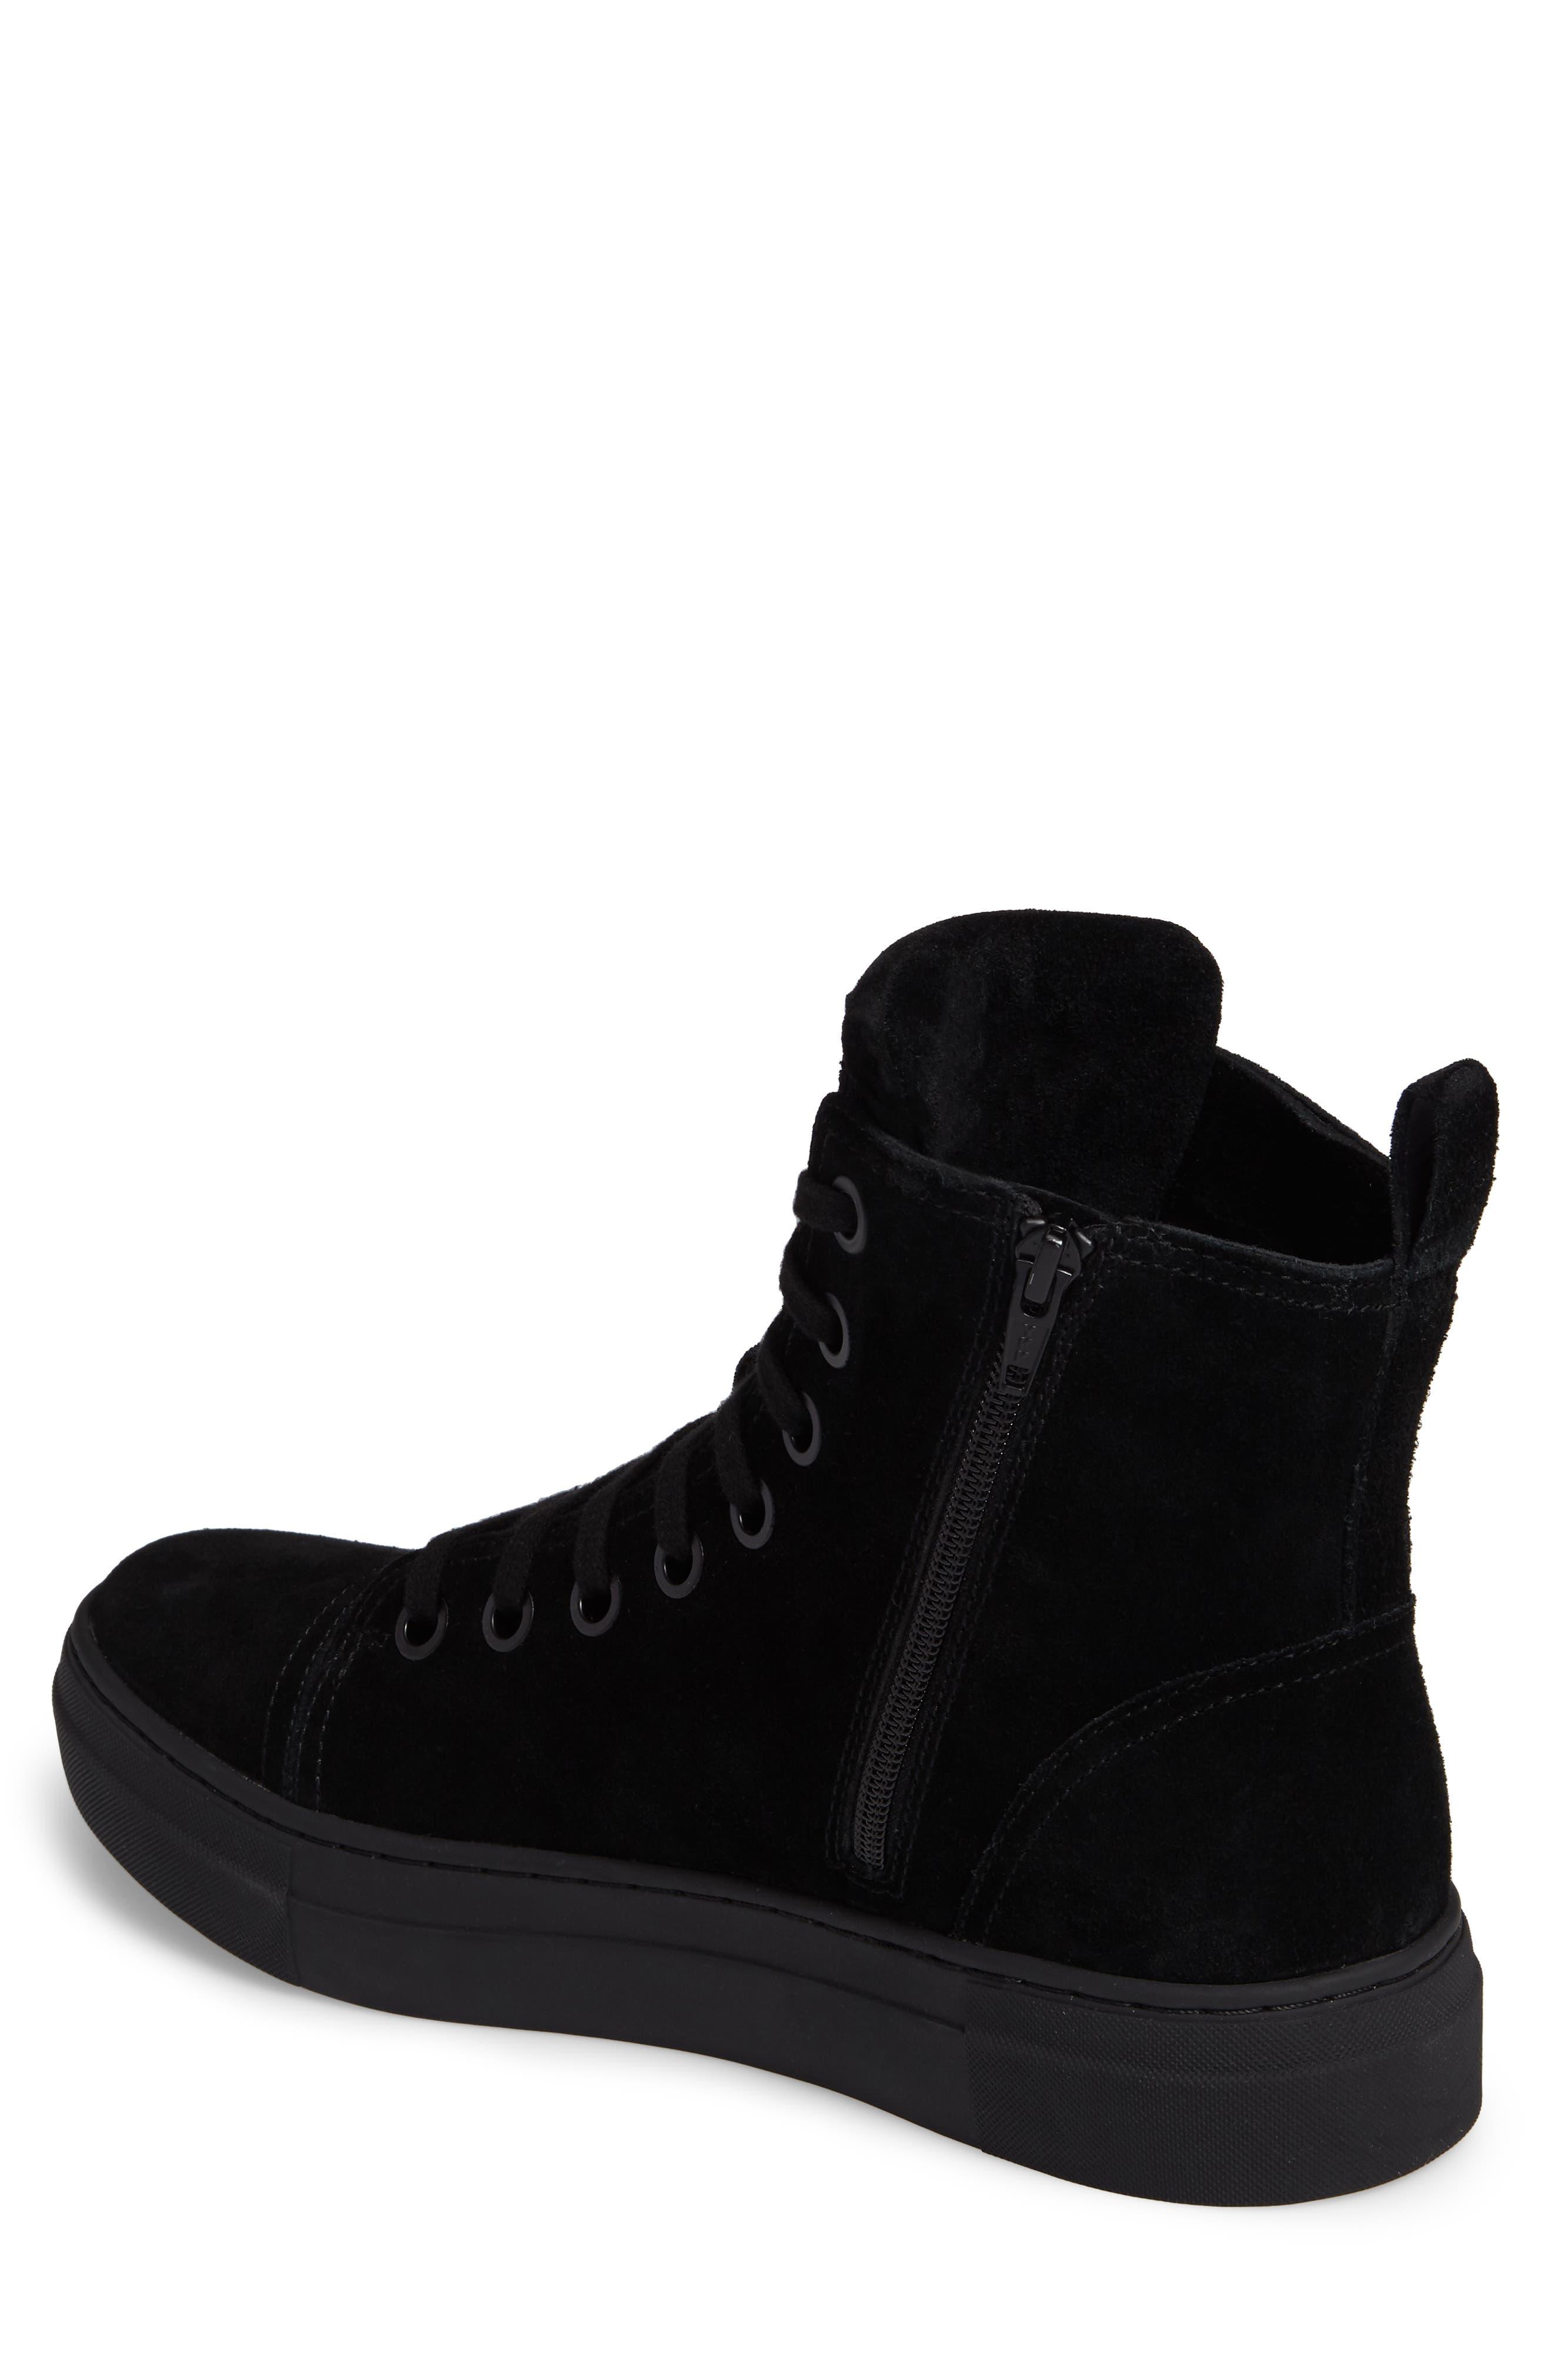 Ormisten Sneaker,                             Alternate thumbnail 2, color,                             Black Suede